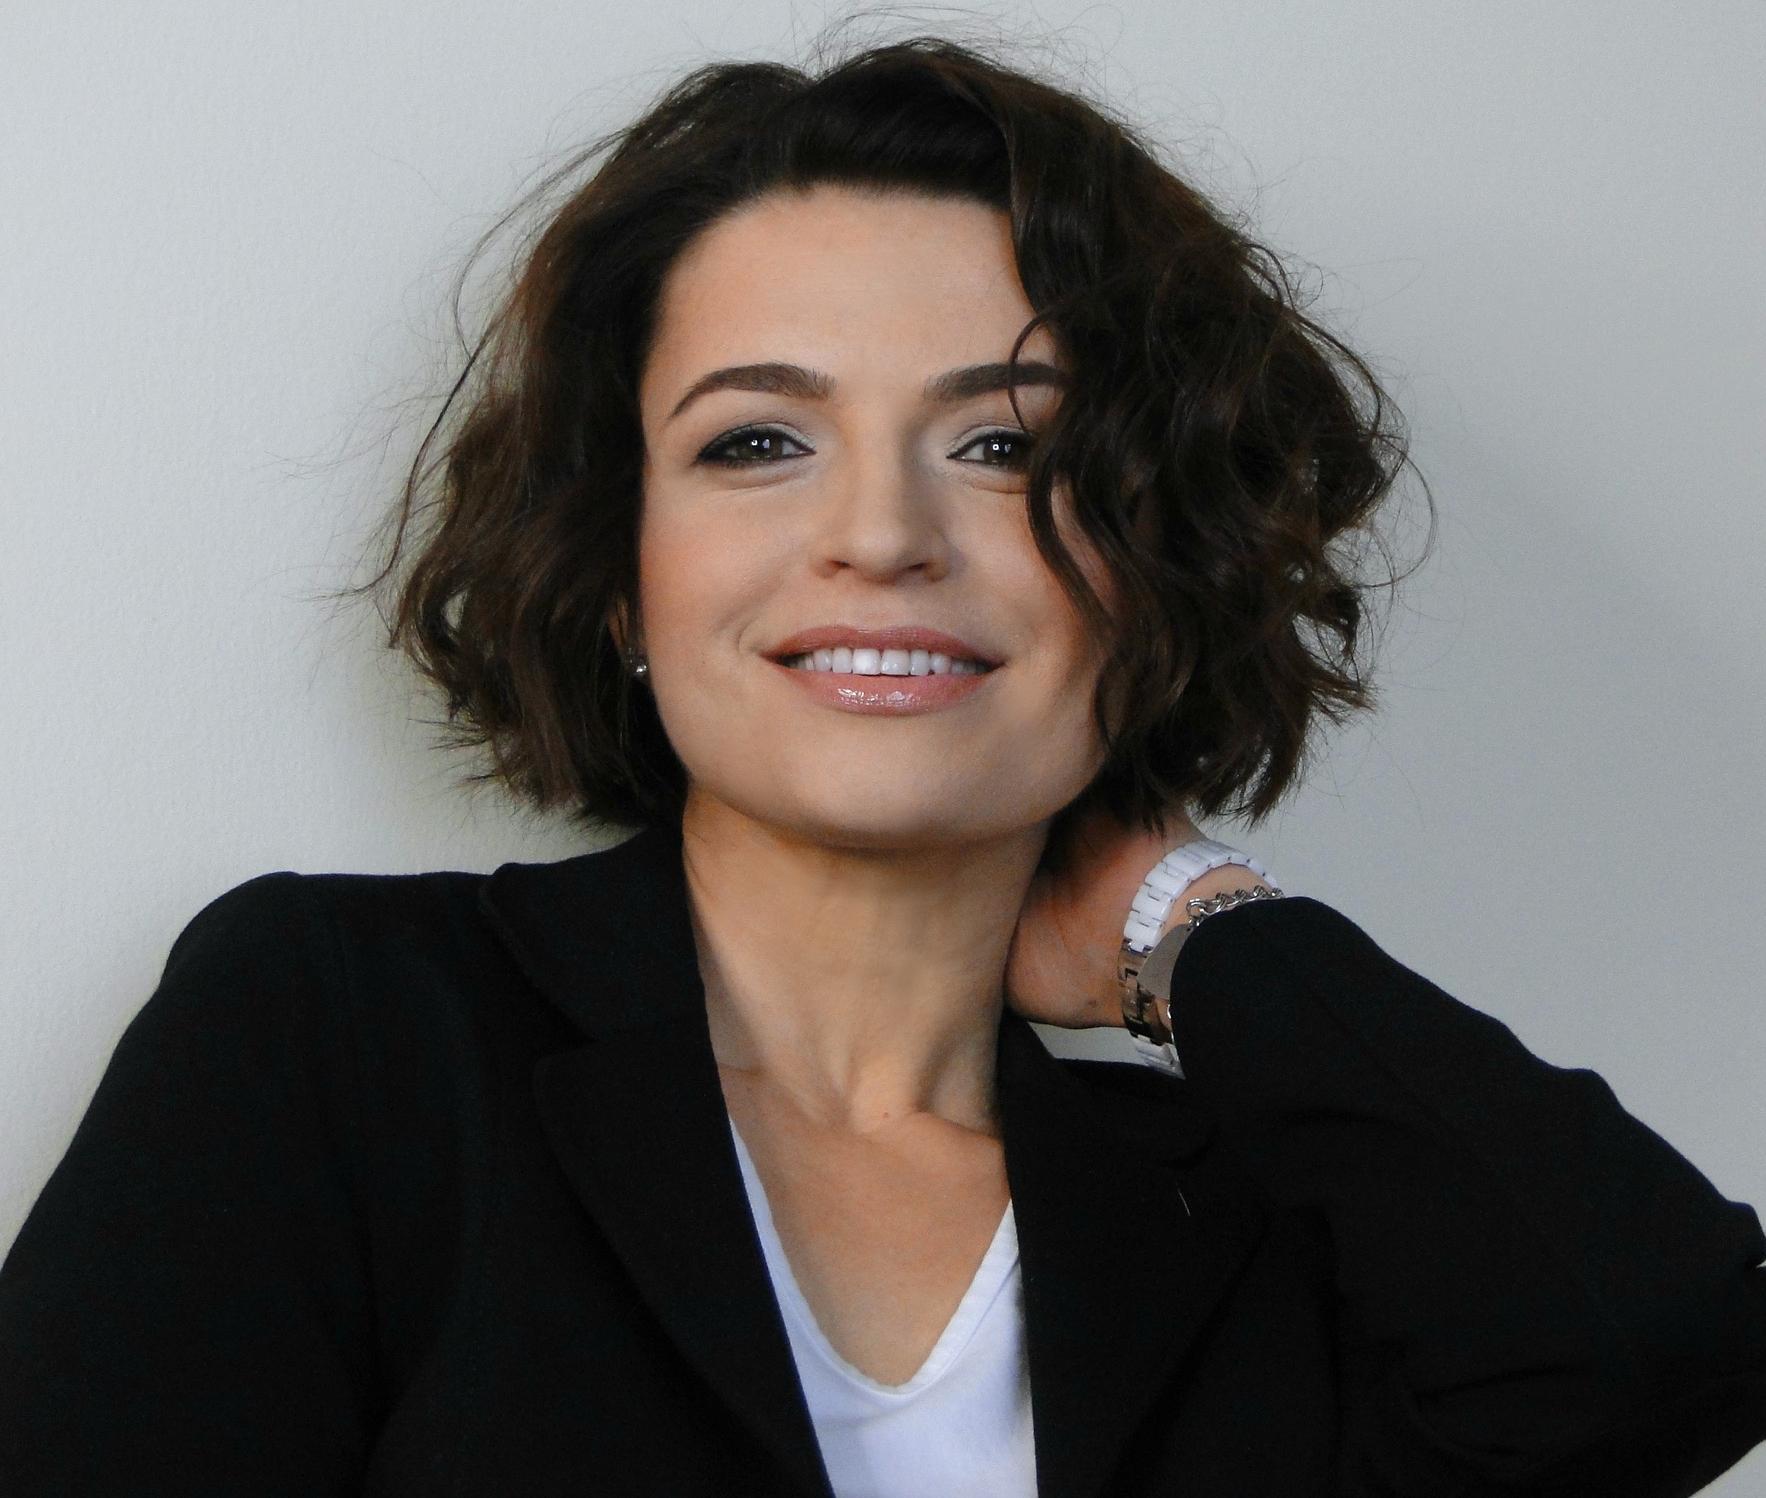 Tatyana Wilcox